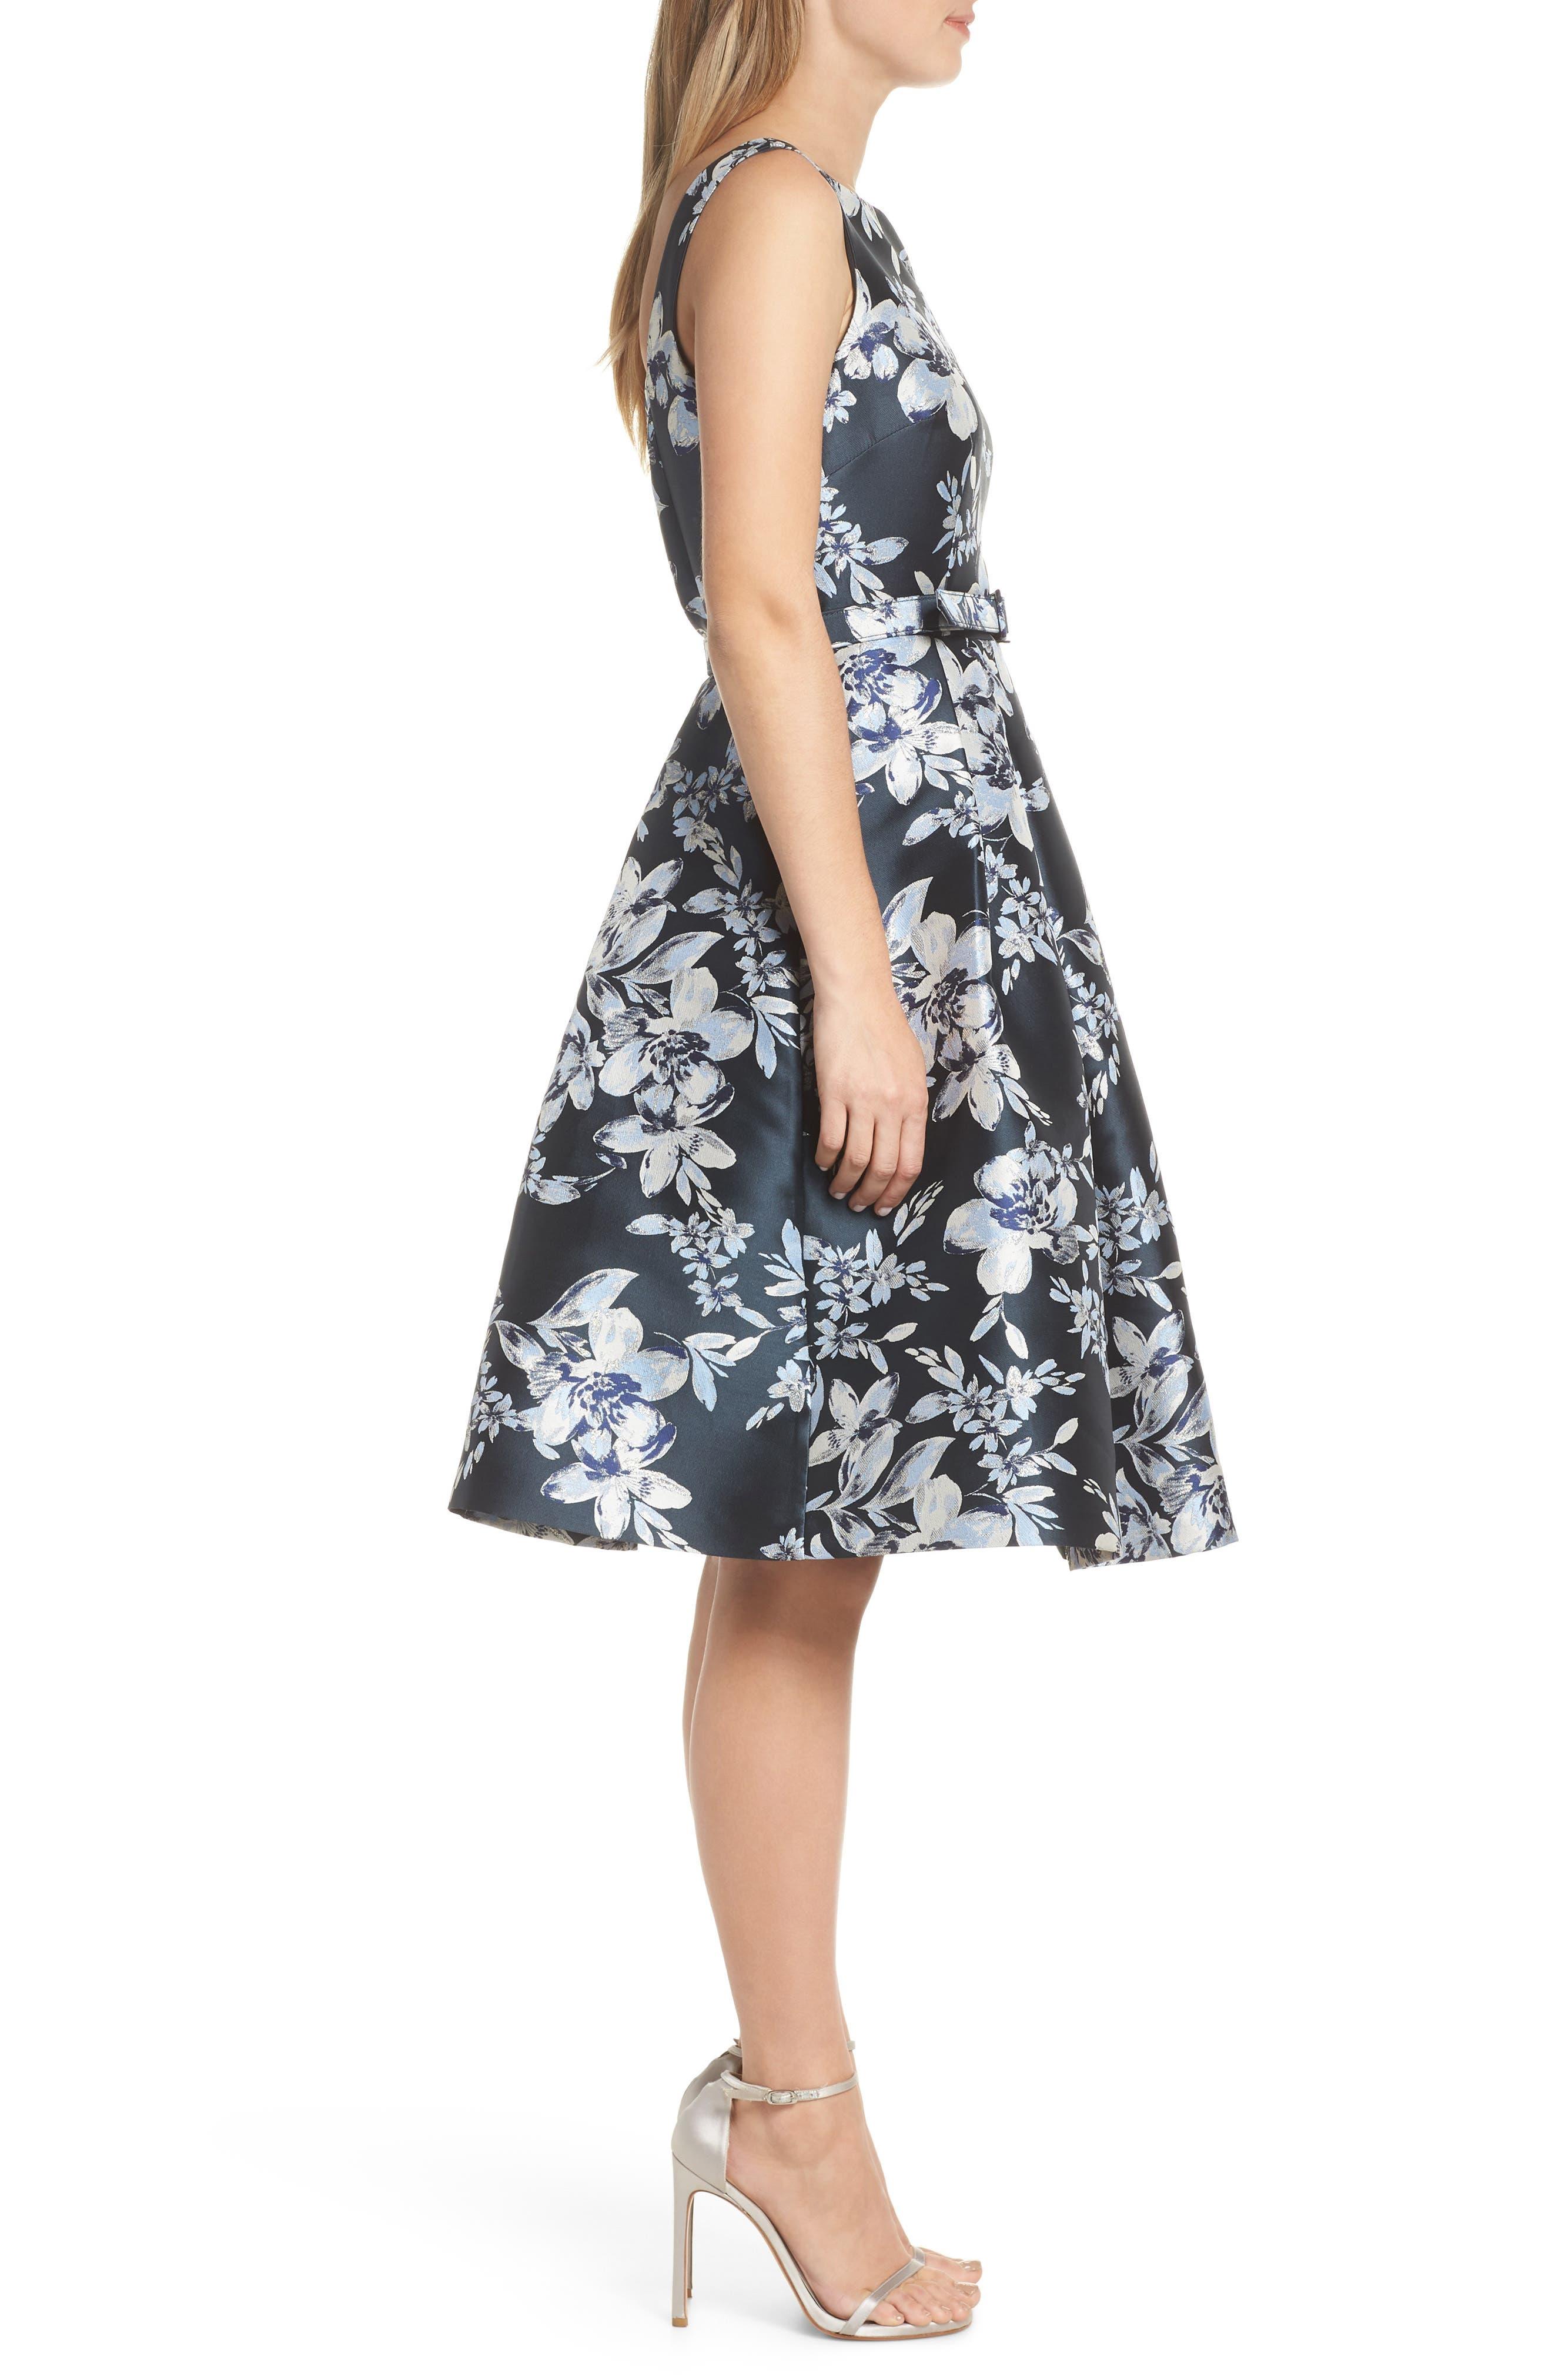 ELIZA J, Metallic Floral Belted Fit & Flare Dress, Alternate thumbnail 4, color, NAVY